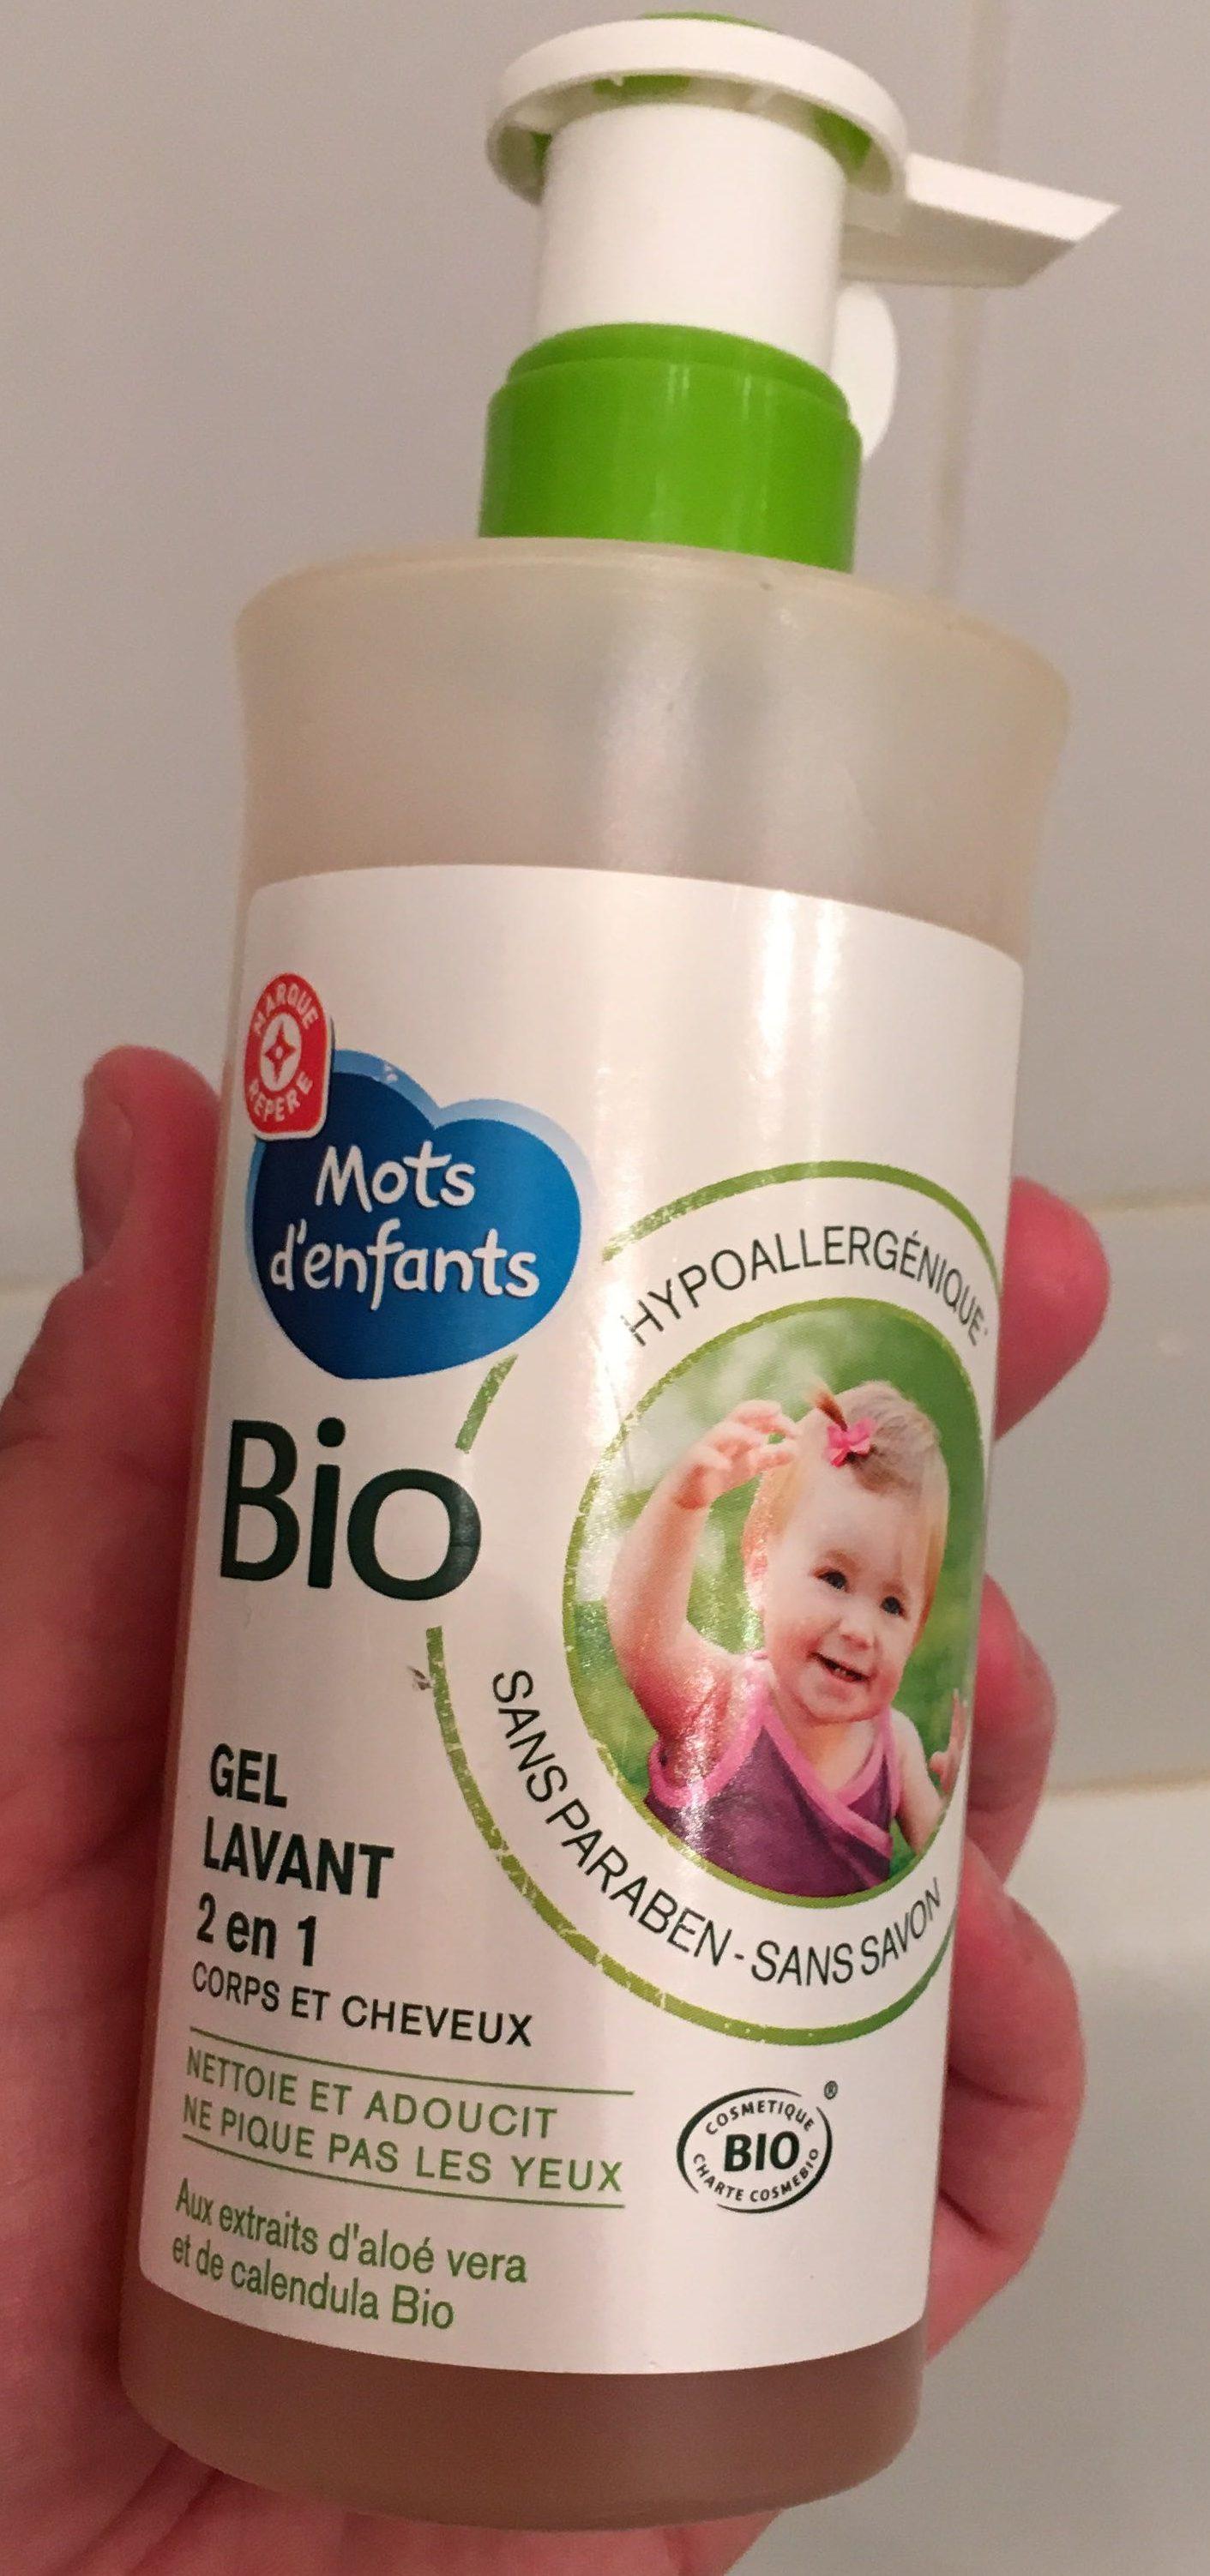 Gel lavant 2 en 1 Bio - Product